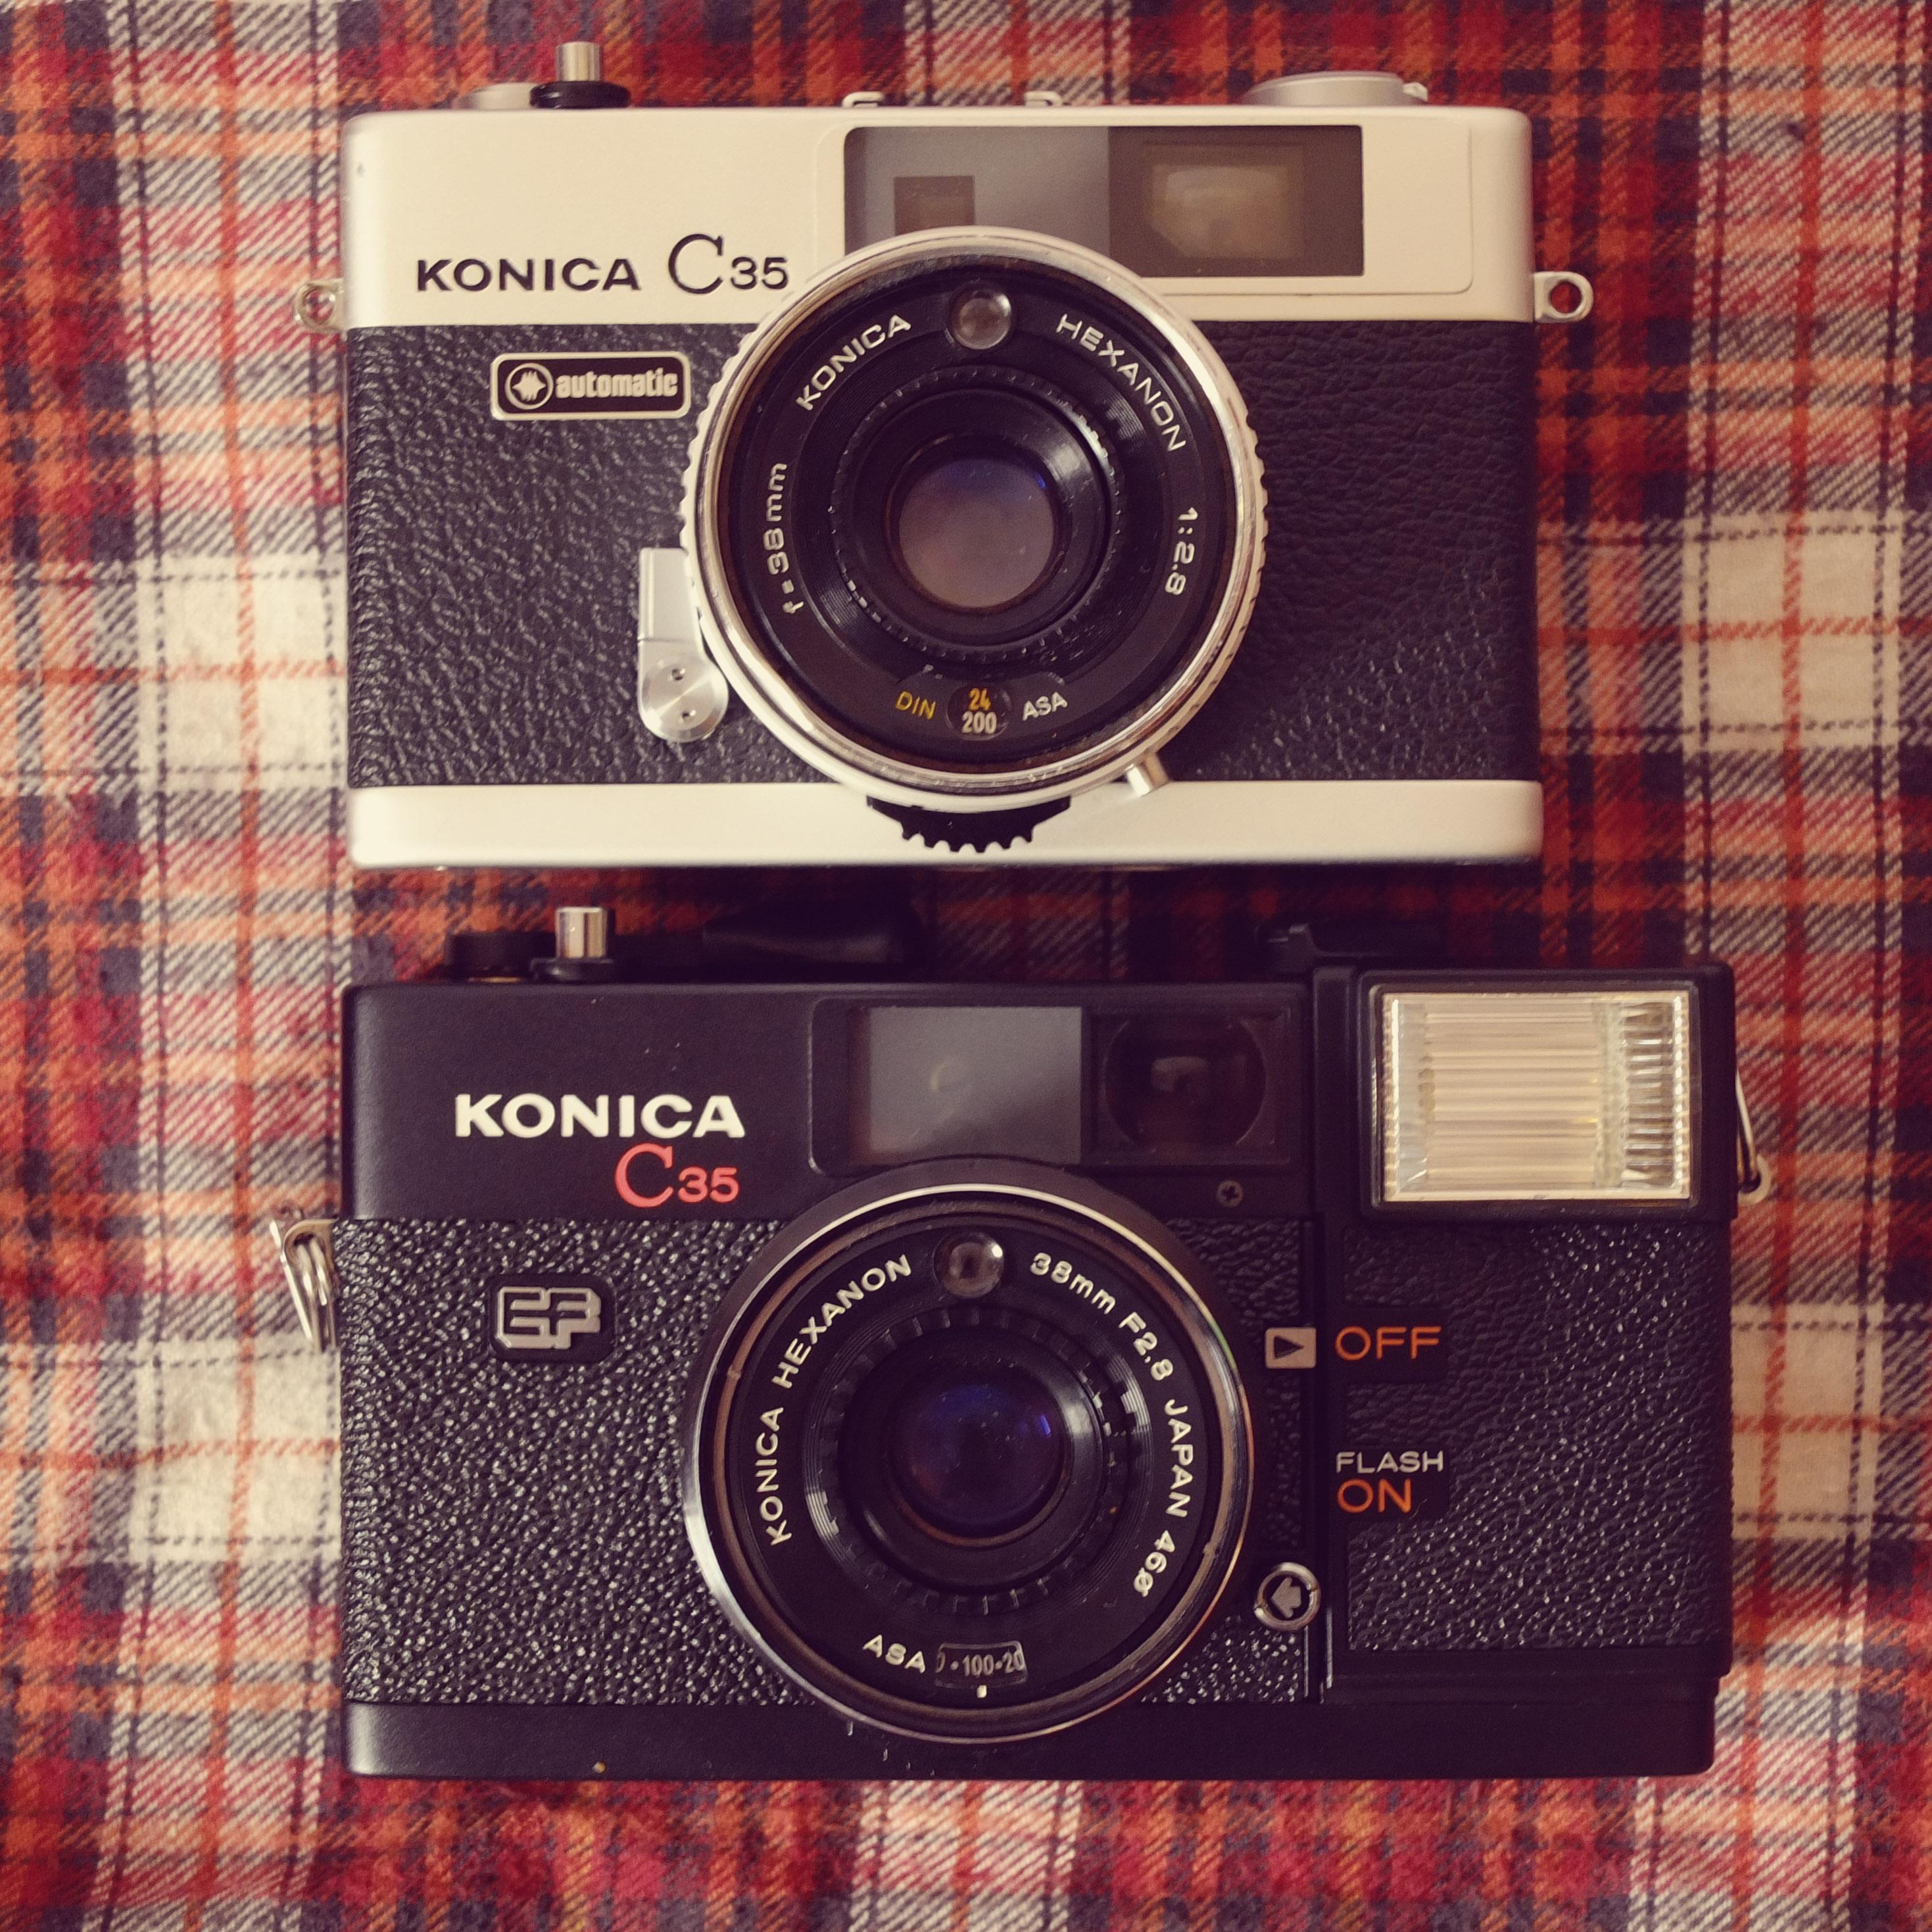 8Mm Vintage Camera free images : vintage, adventure, travel, analog, nostalgia